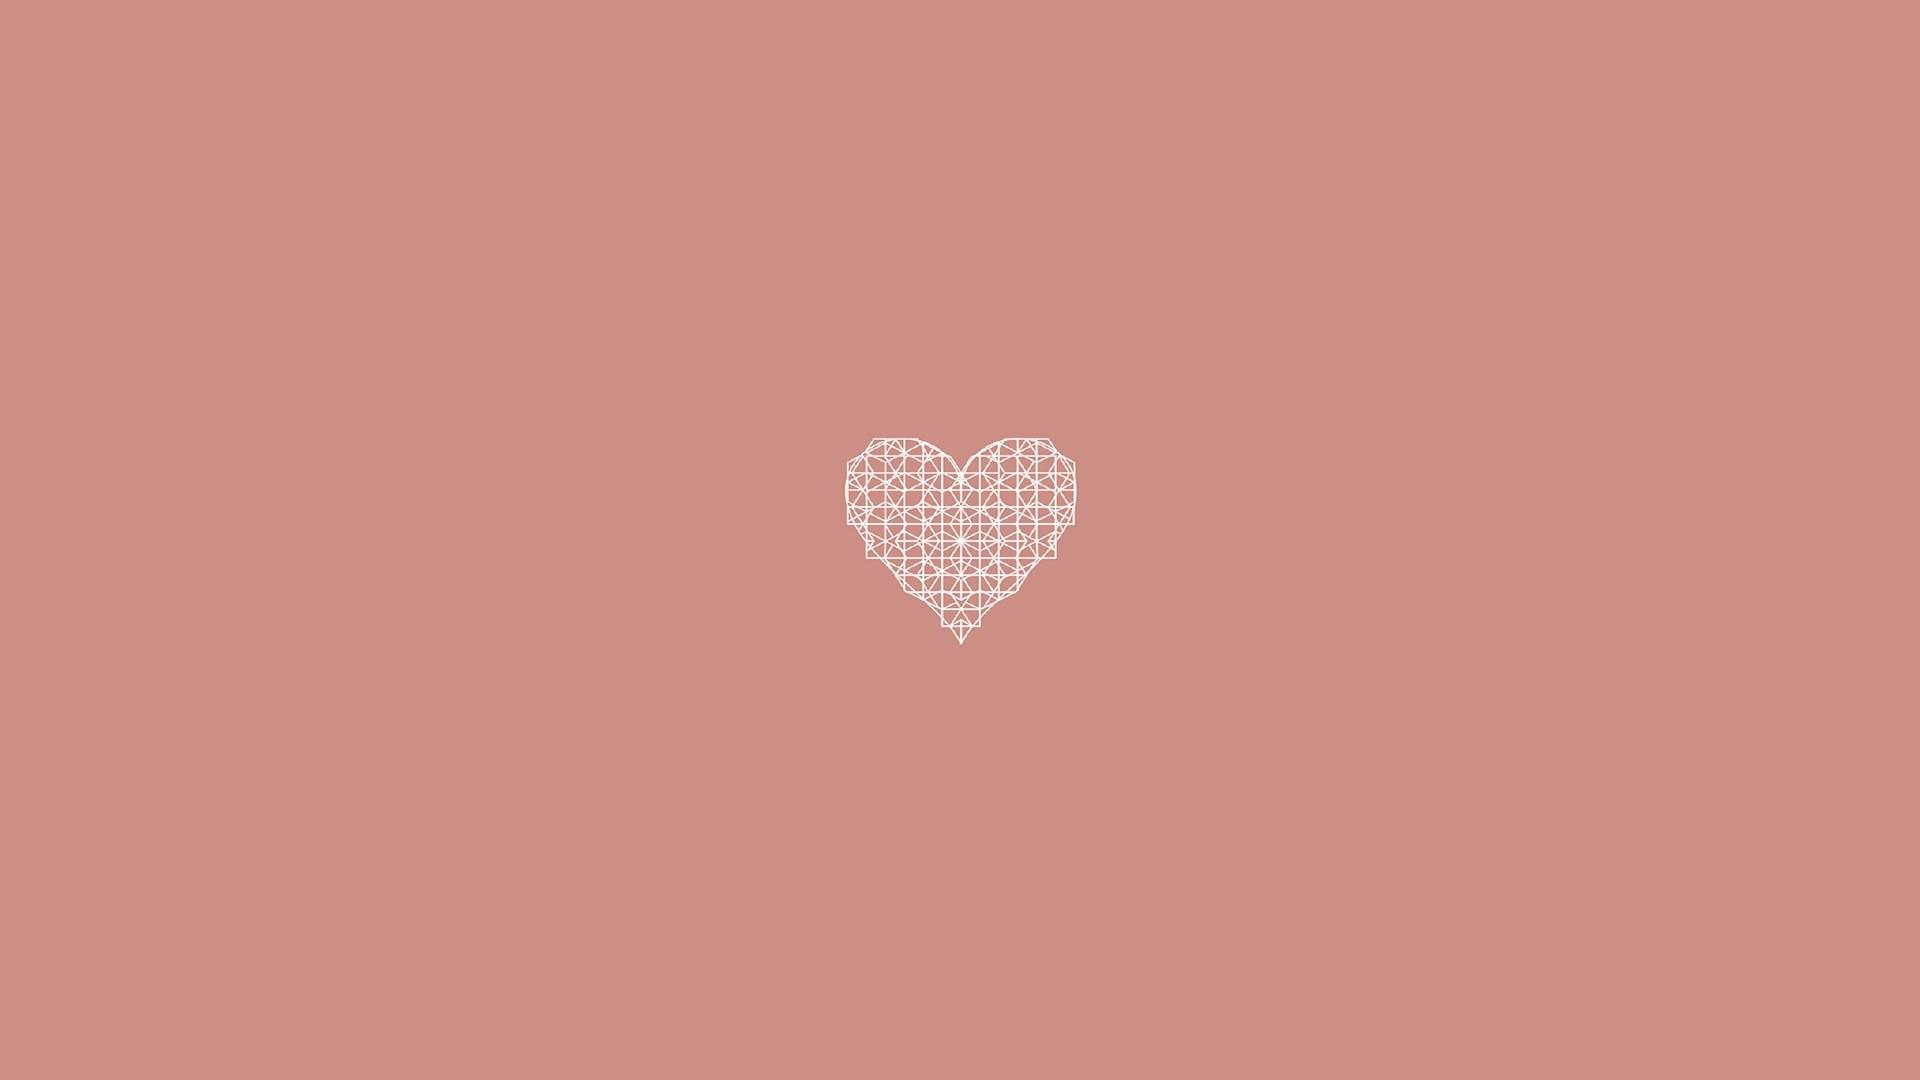 Cute Simple hd wallpaper download